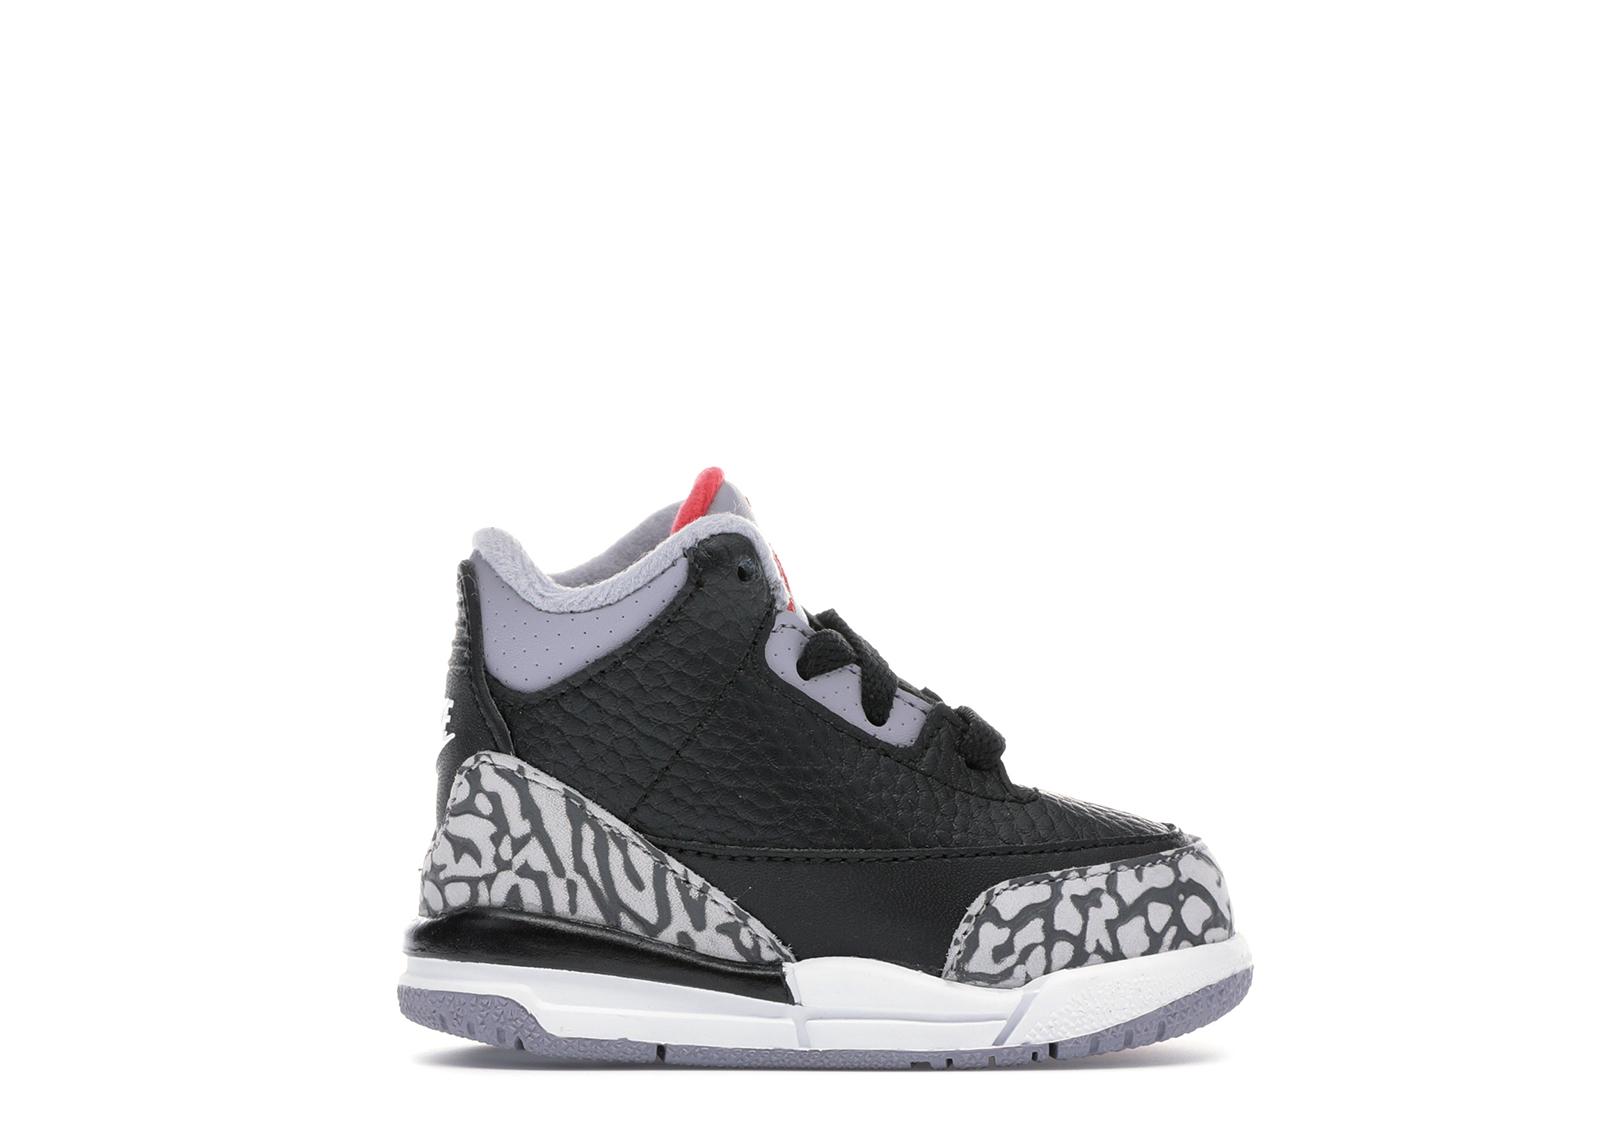 Jordan 3 Retro Black Cement 2018 (TD